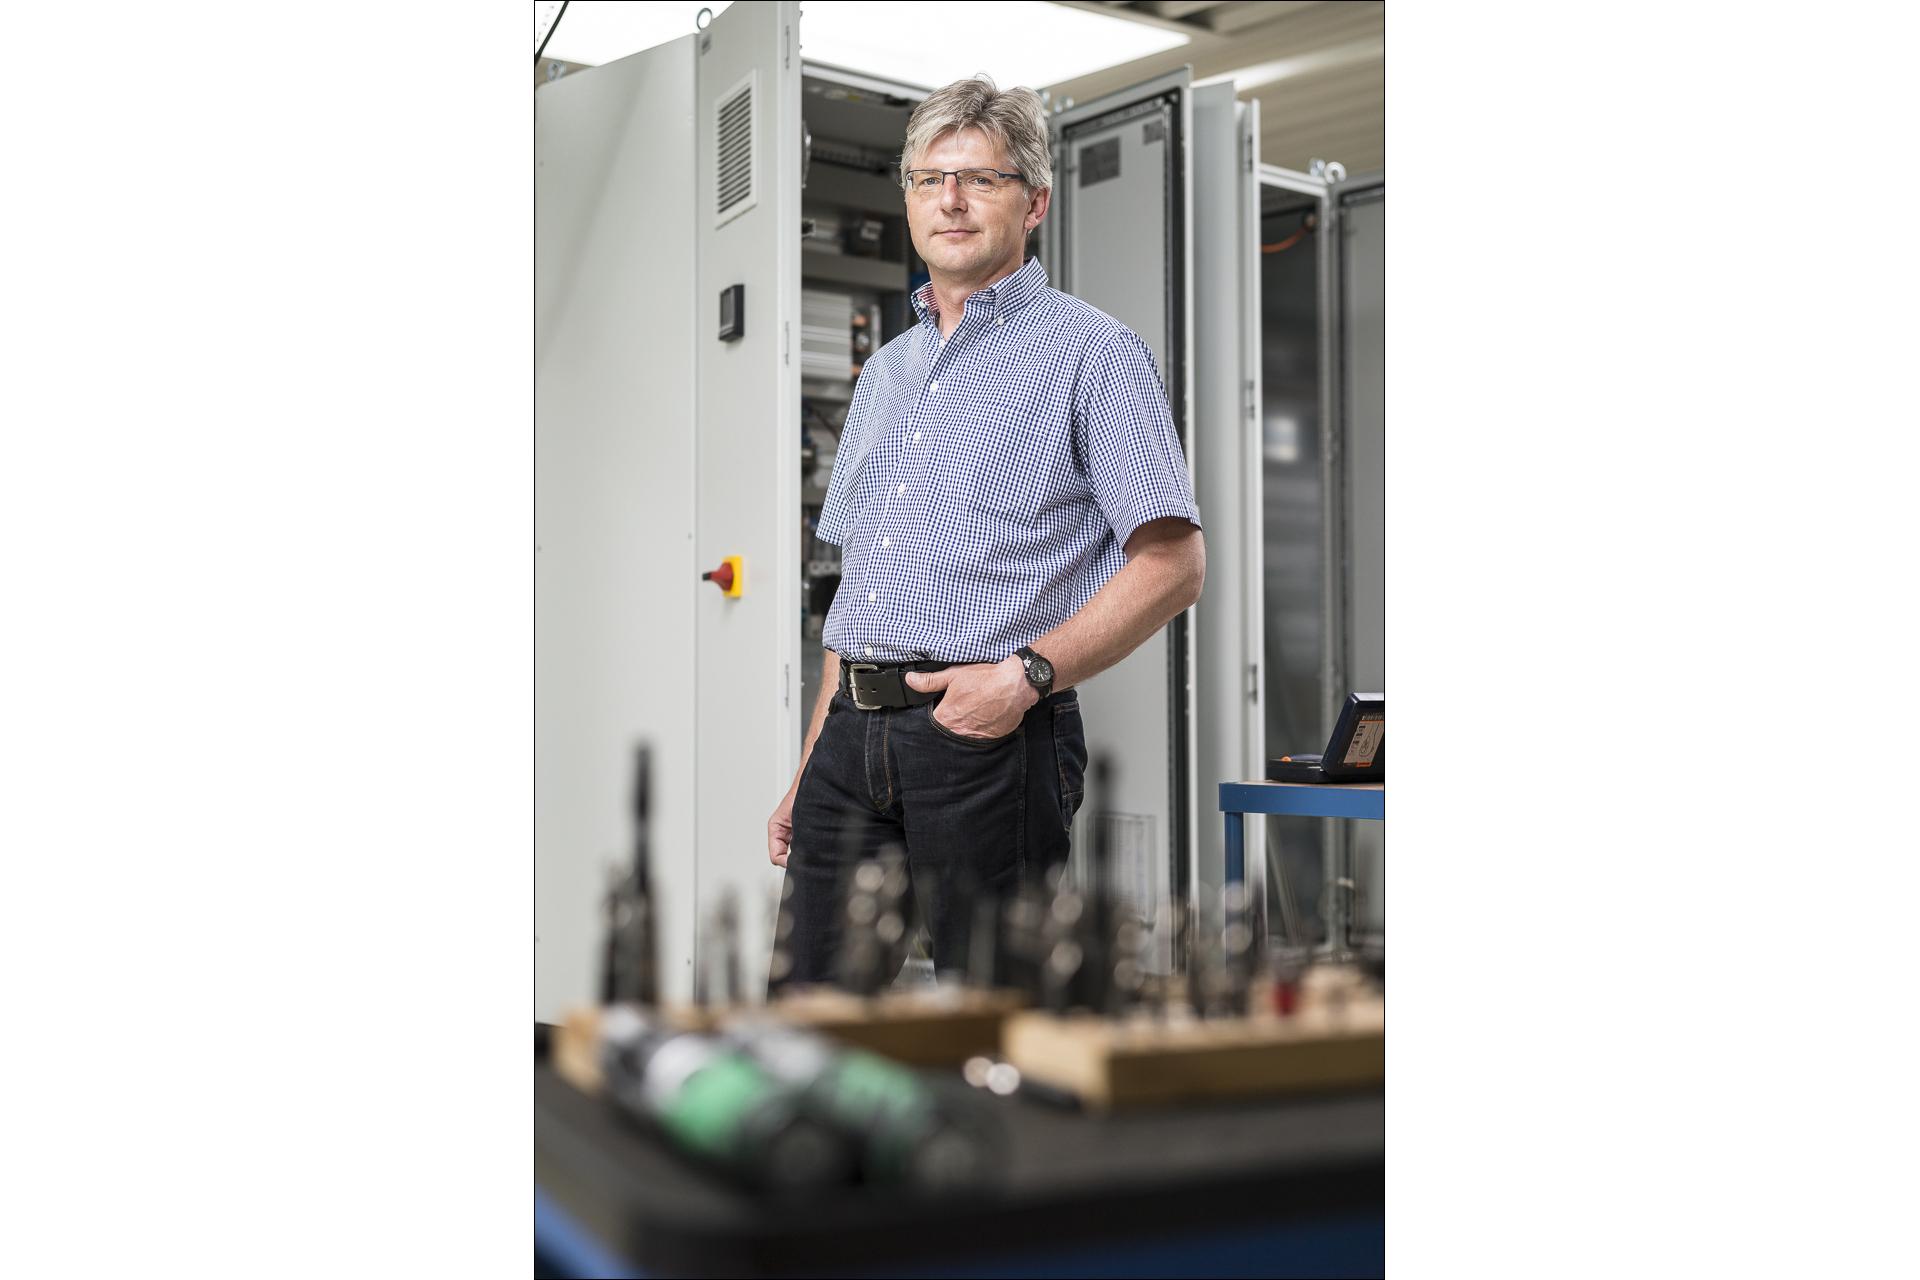 DEU, 09366 Niederdorf, HEROS Anlagenautomatisierung, Thomas Leis, GF